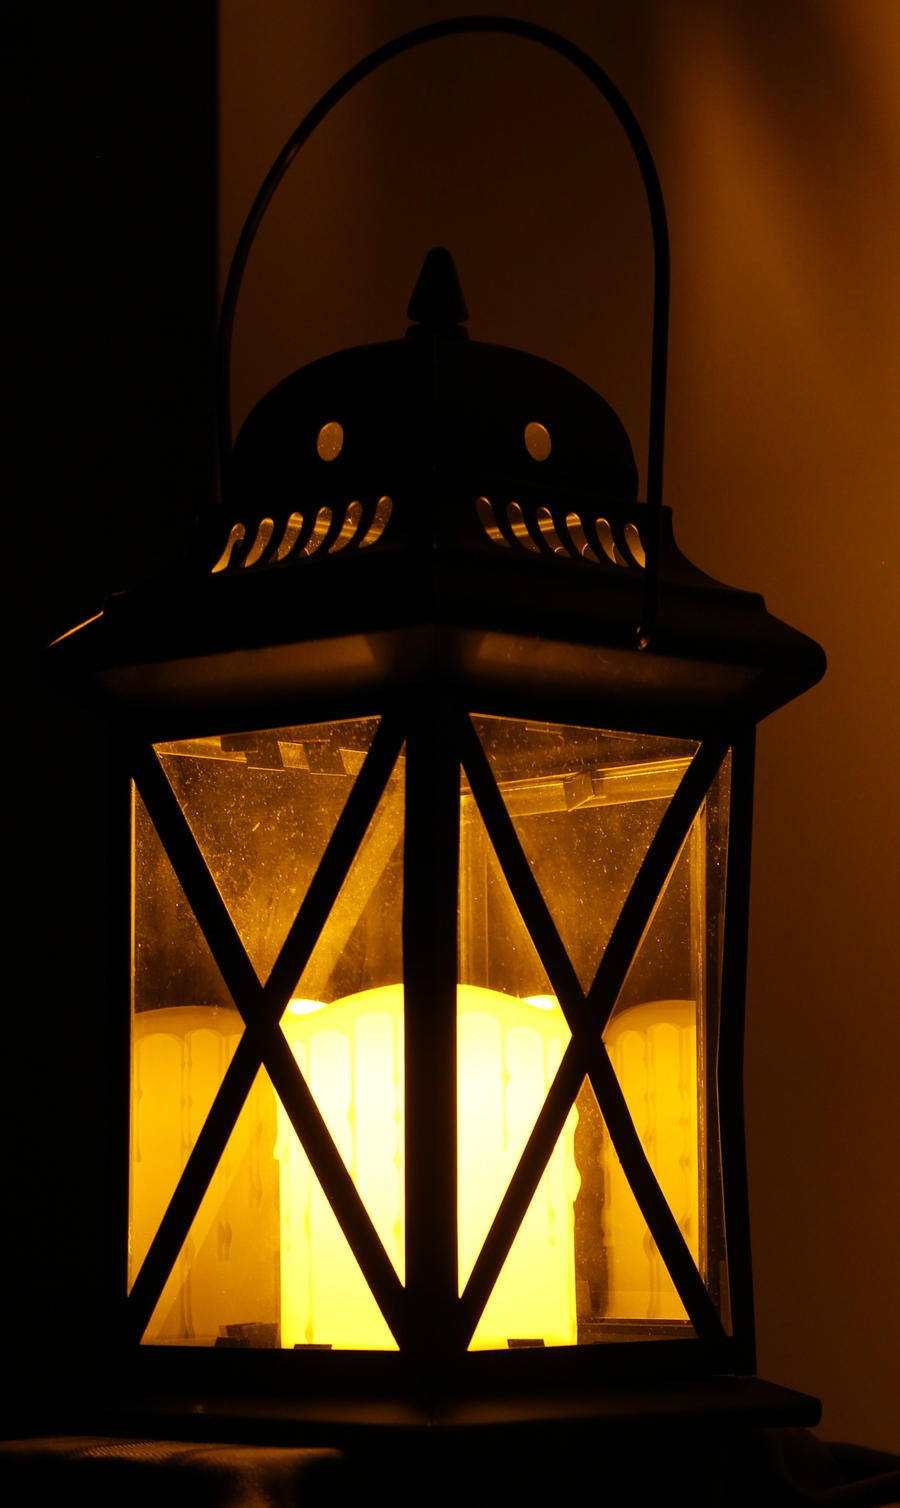 Old Lamp 2 By MickBarber Old Lamp 2 By MickBarber